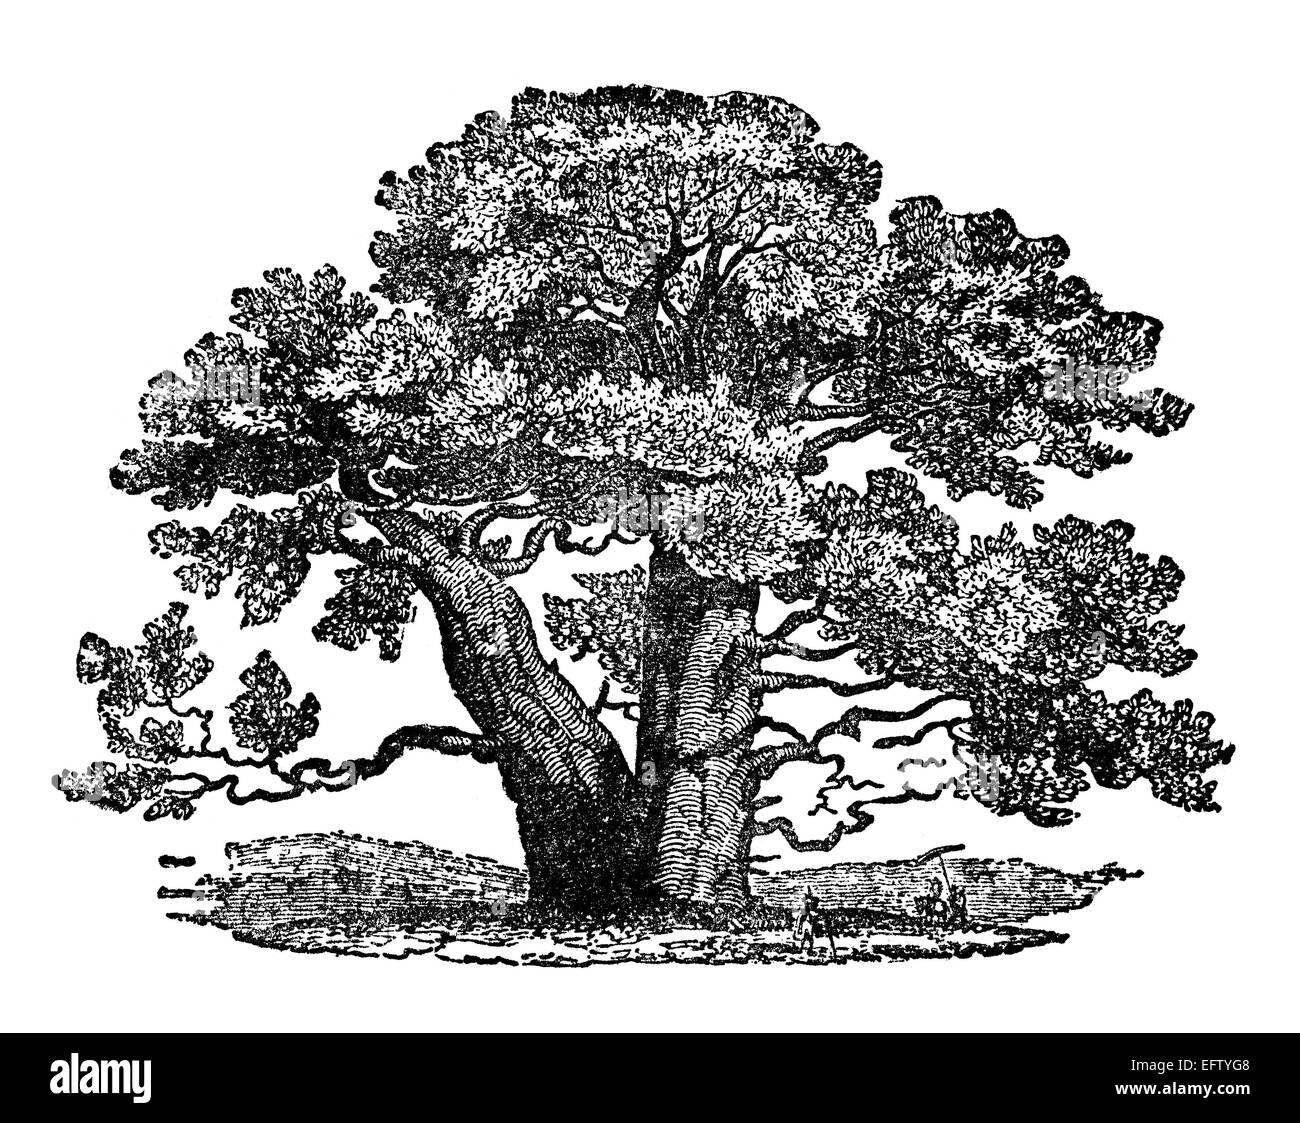 Baobab Tree Black and White Stock Photos & Images - Alamy